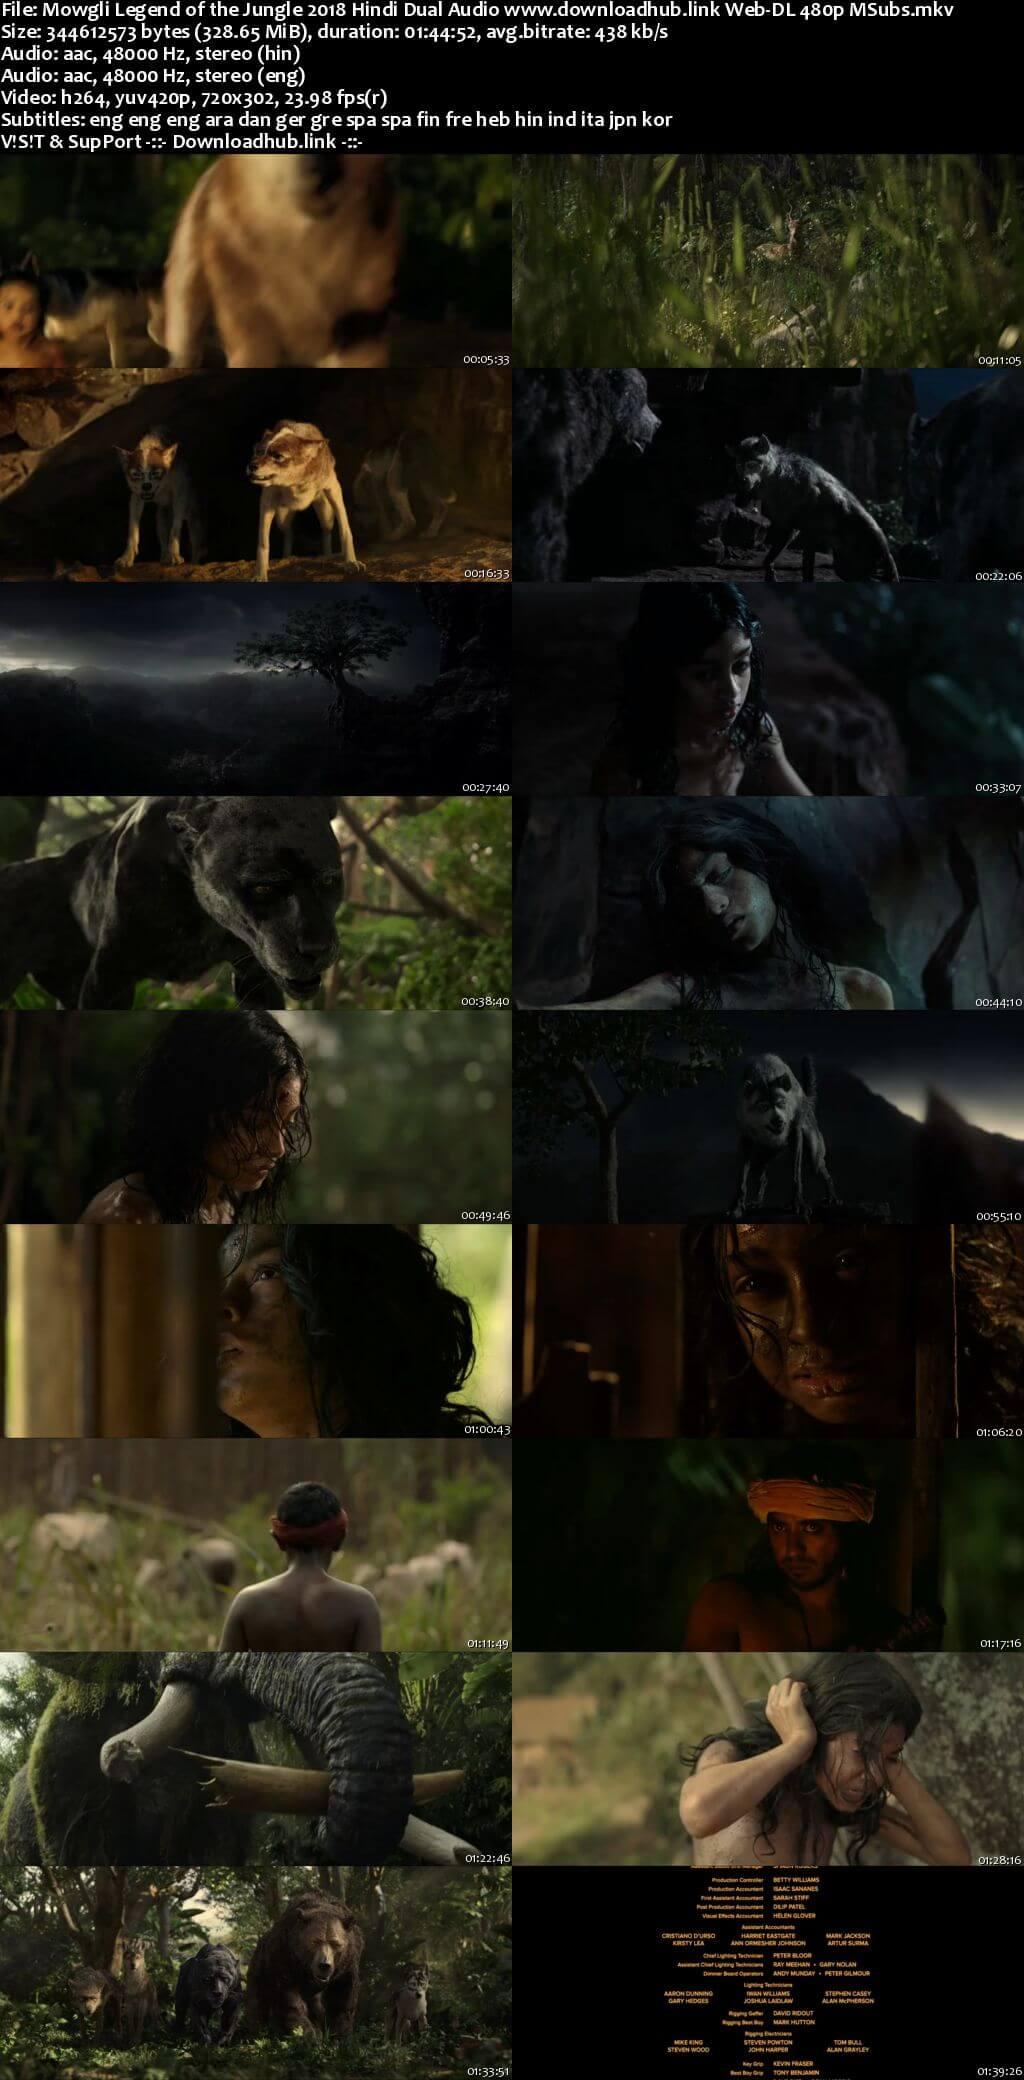 Mowgli Legend of the Jungle 2018 Hindi Dual Audio 300MB Web-DL 480p MSubs